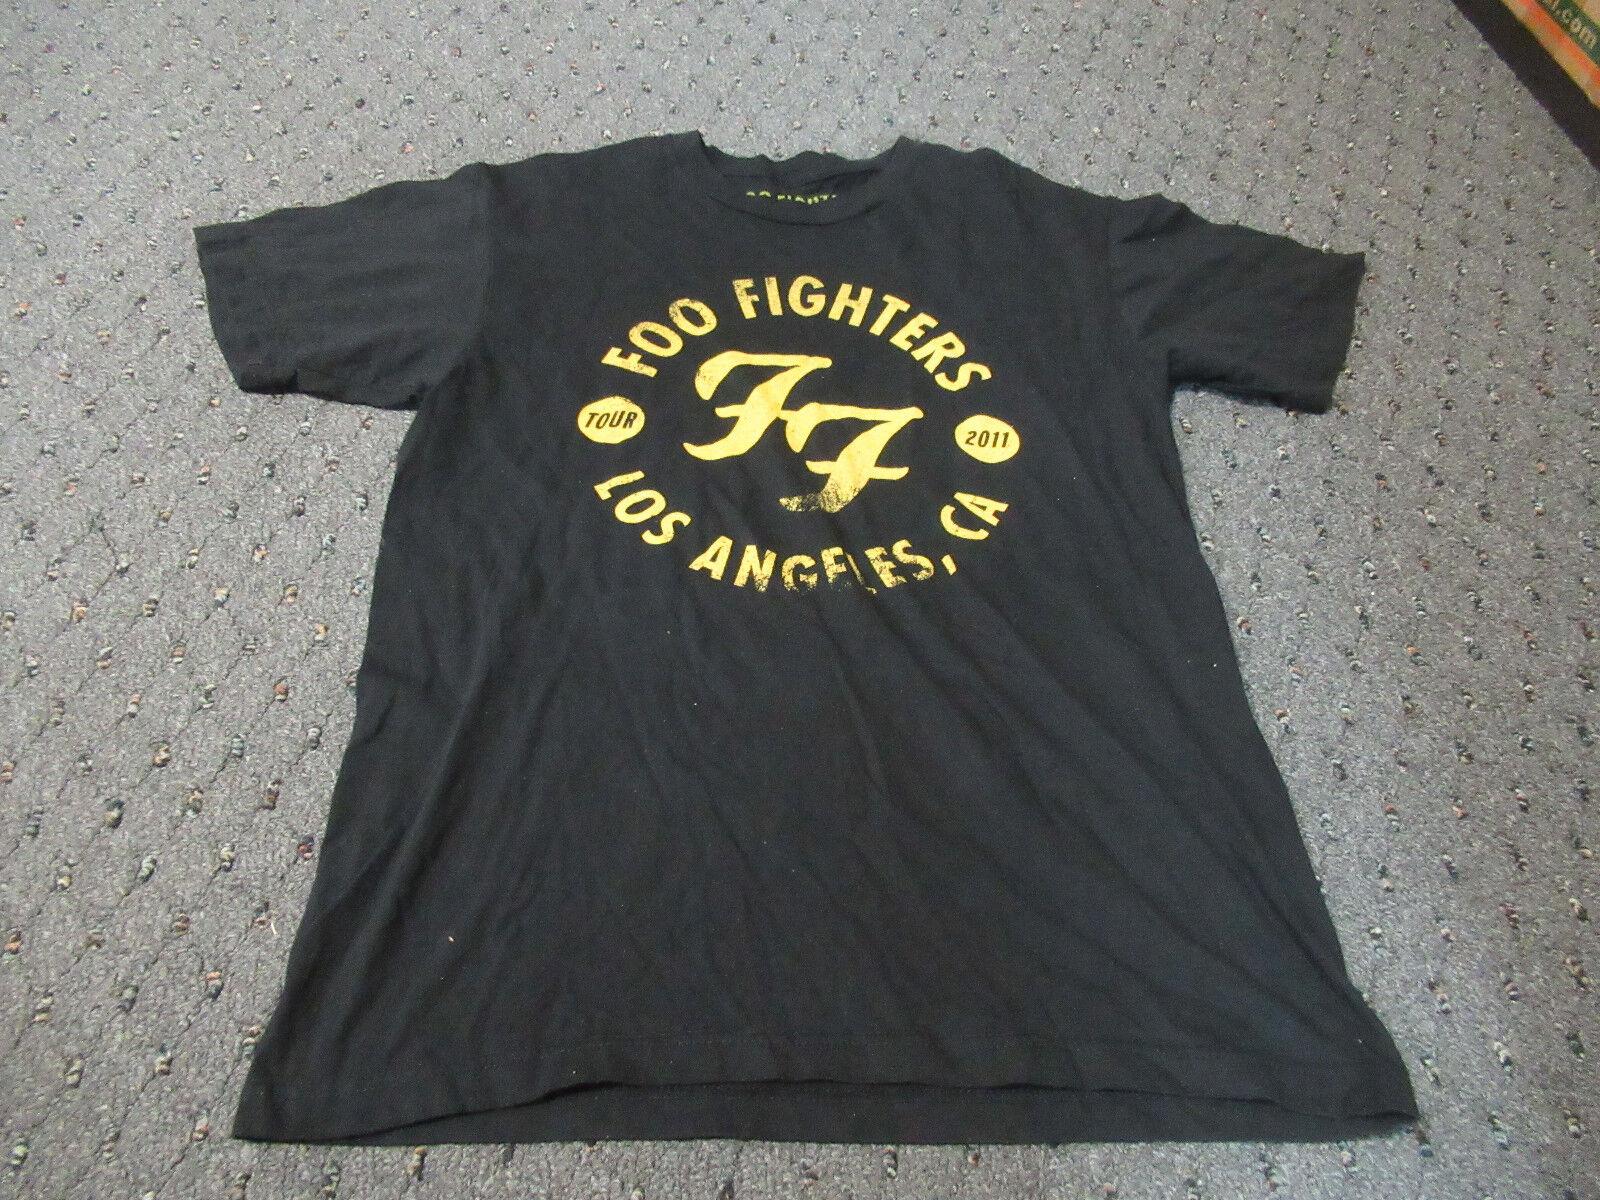 2011 FOO FIGHTERS LOS ANGELES FORUM TOUR T SHIRT